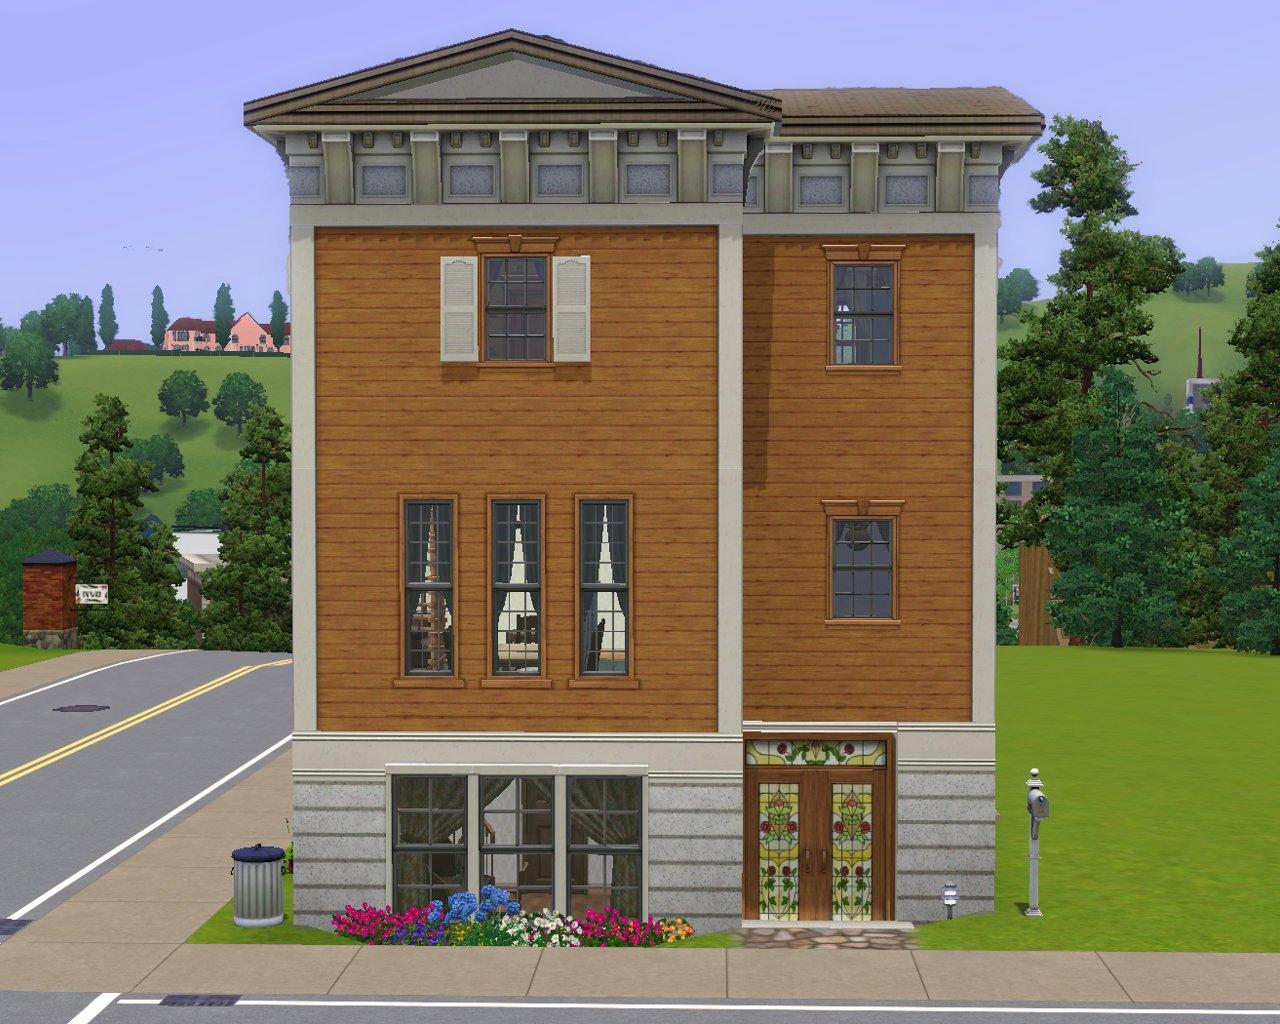 Mod The Sims - Grecian Gables Mini Villa